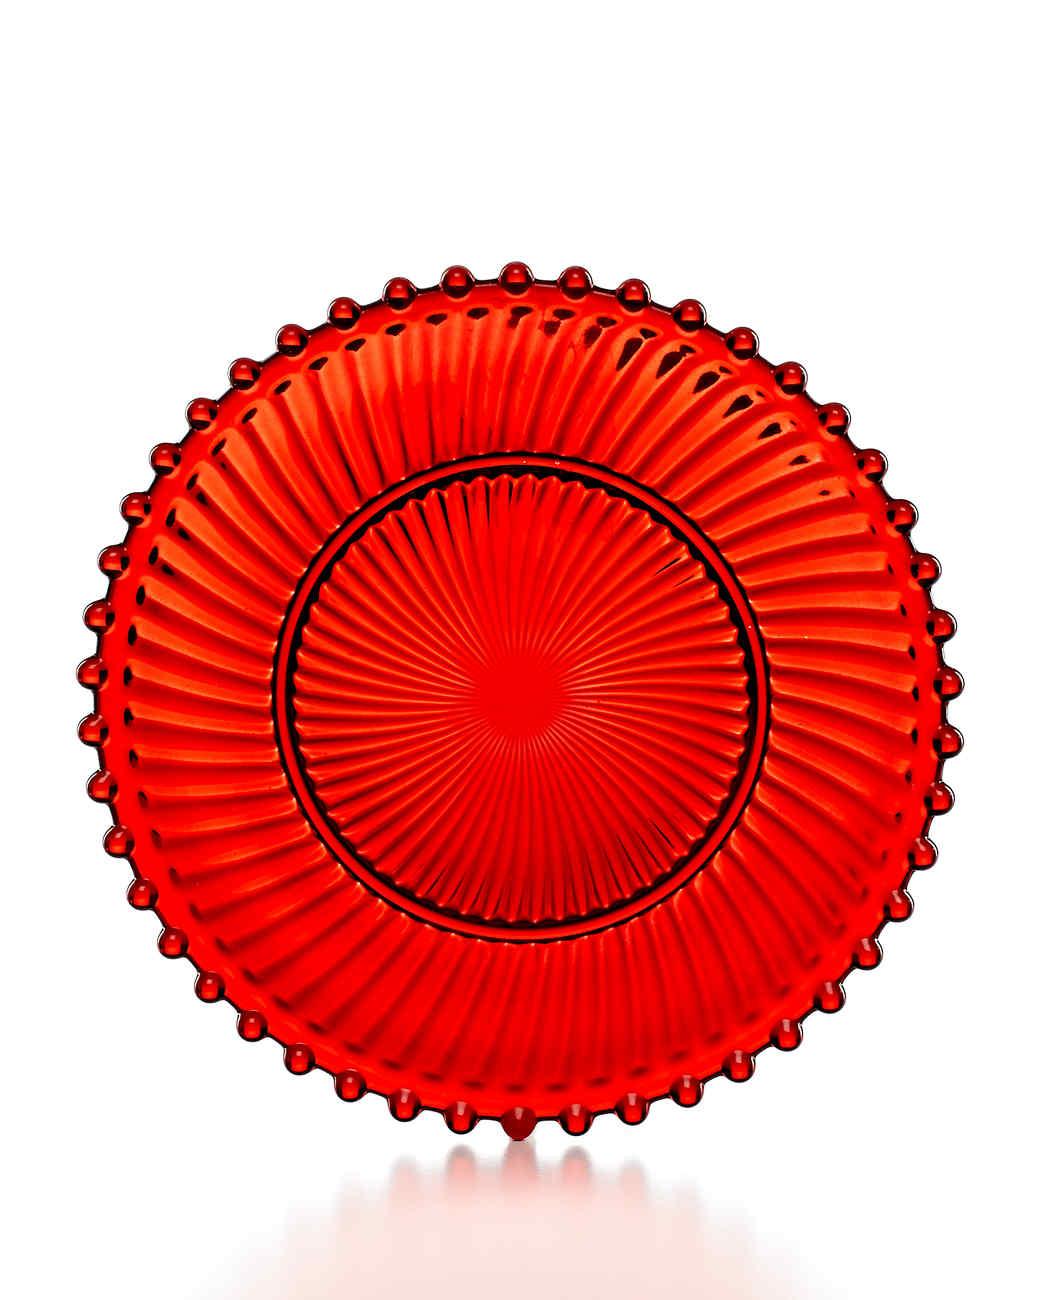 msmacys-dinnerware-red-glass-dessert-plate-mrkt-1013.jpg